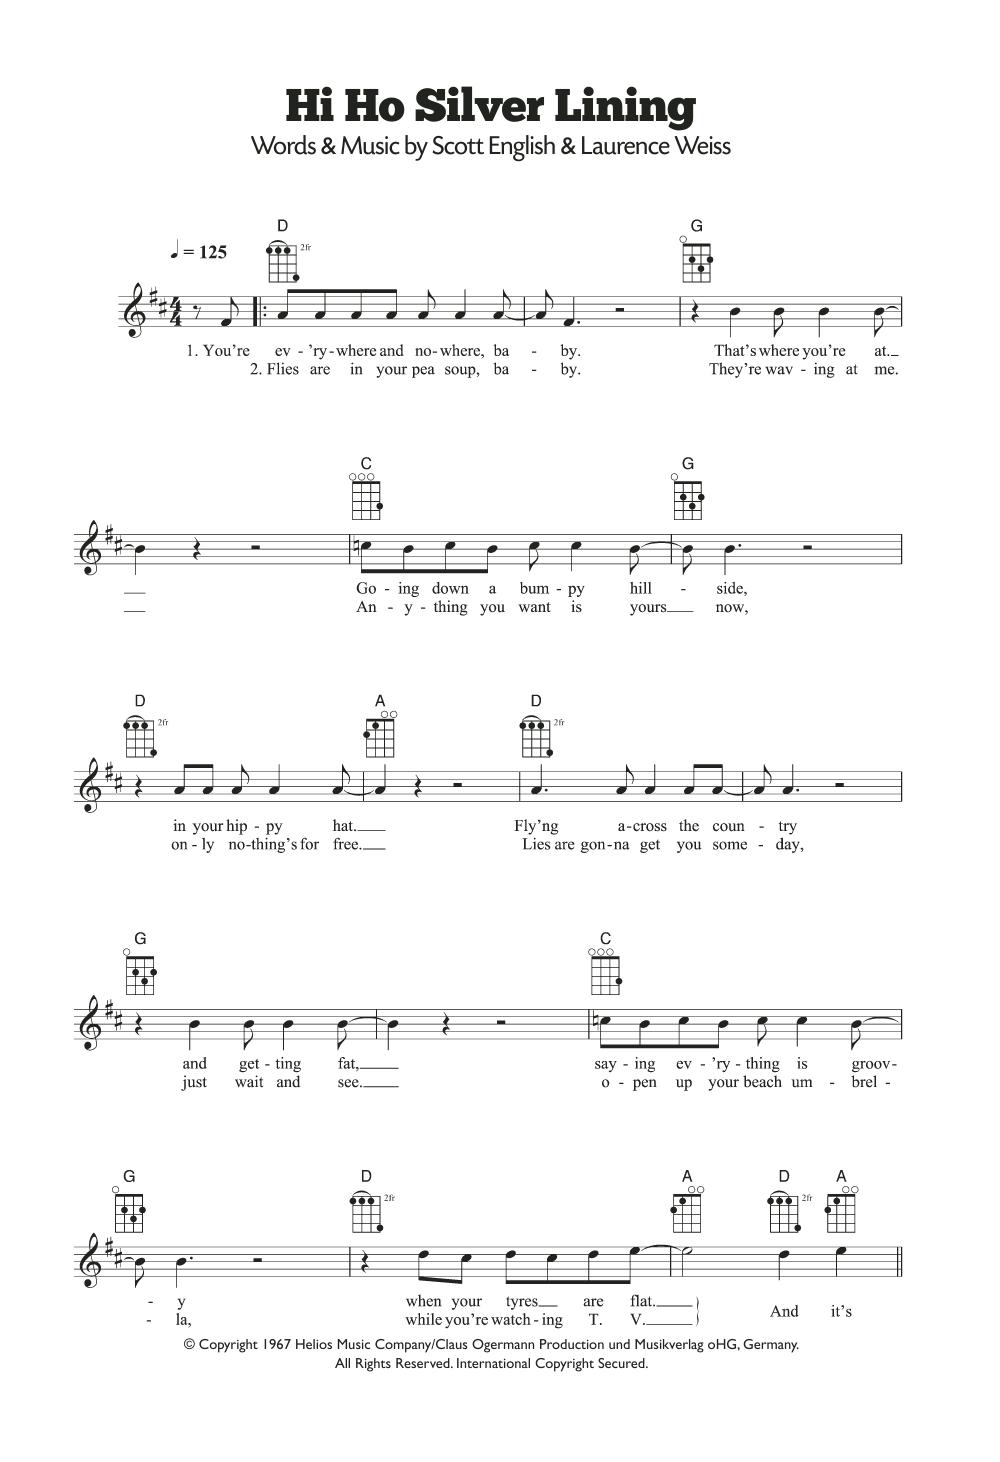 Hi Ho Silver Lining by Jeff Beck - Ukulele - Guitar Instructor